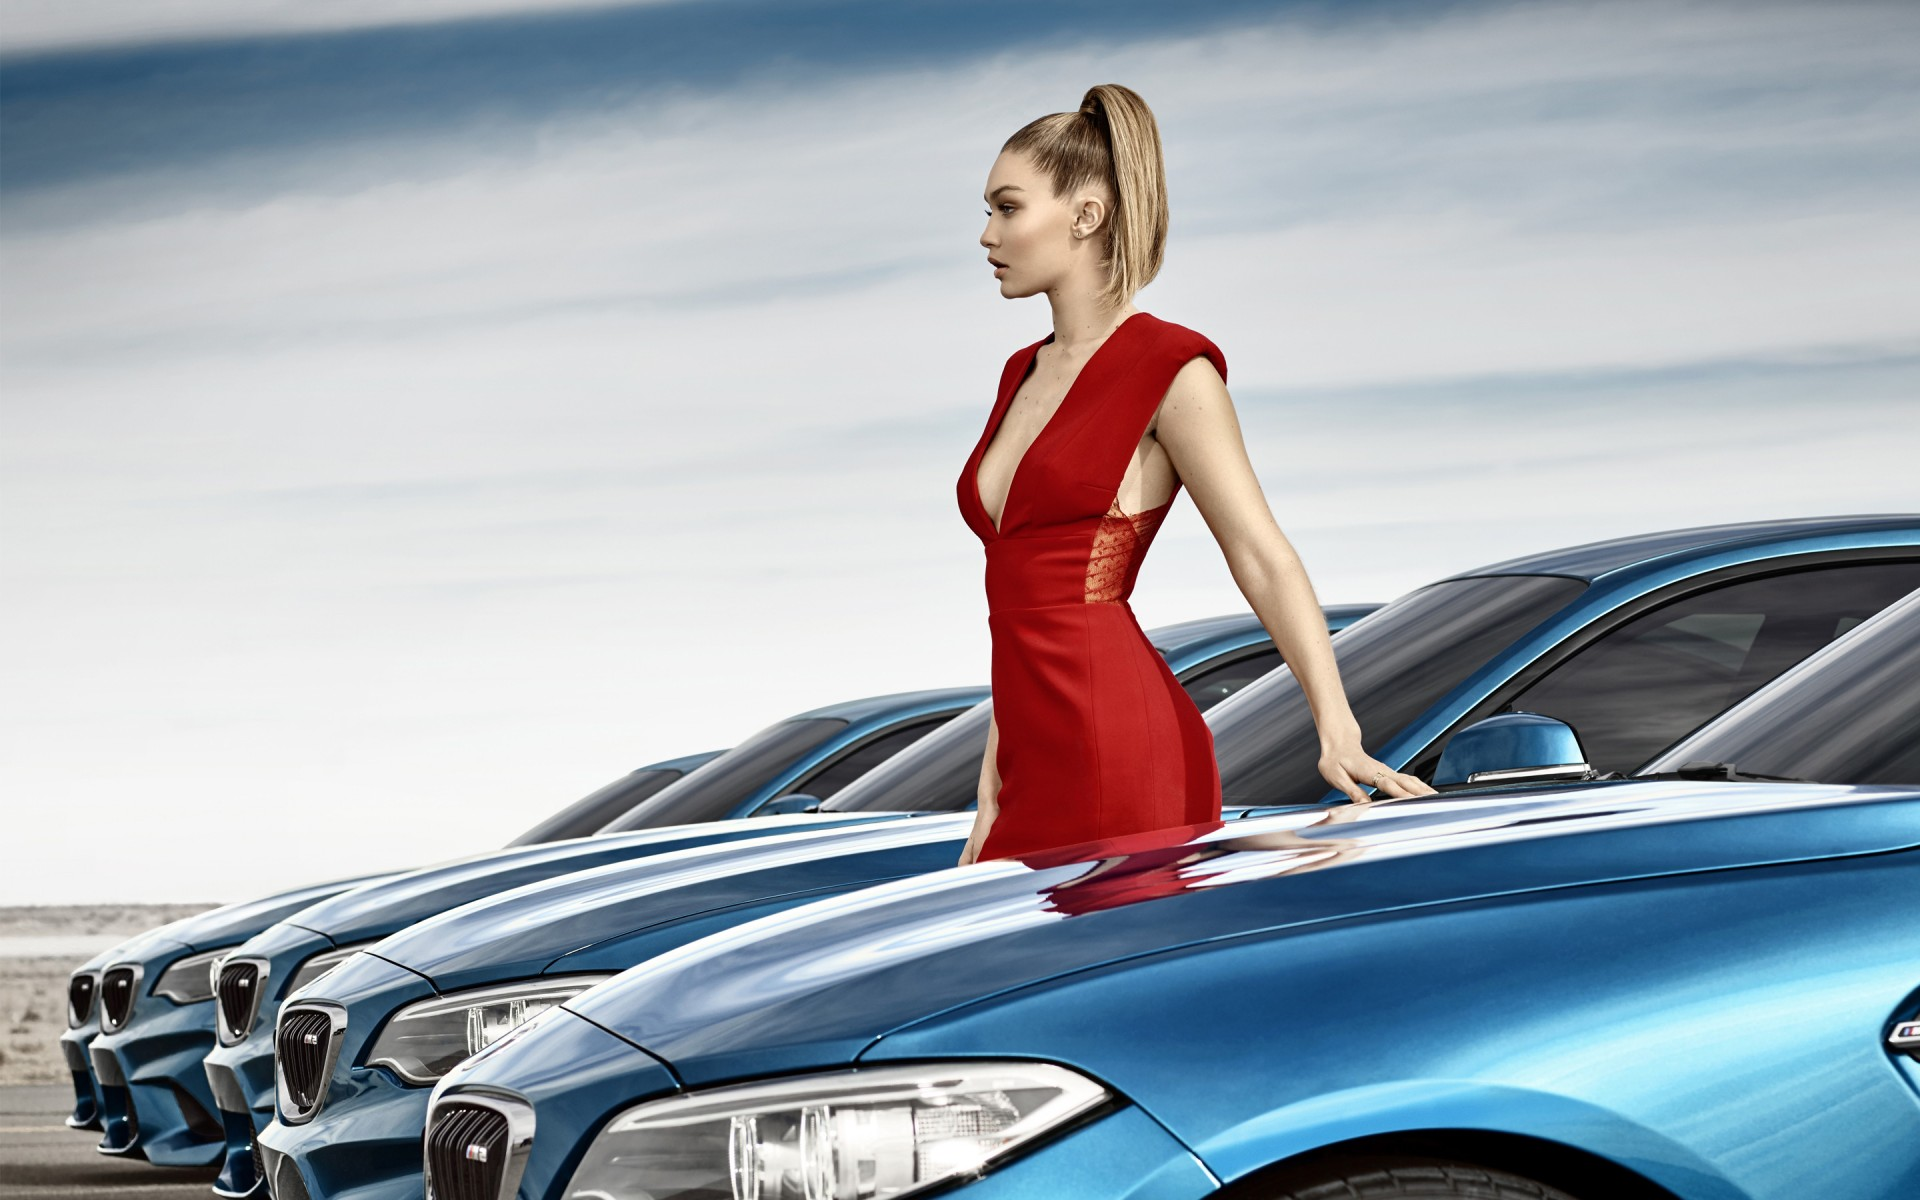 Bmw M2 Coupe Gigi Hadid Wallpaper Hd Car Wallpapers Id